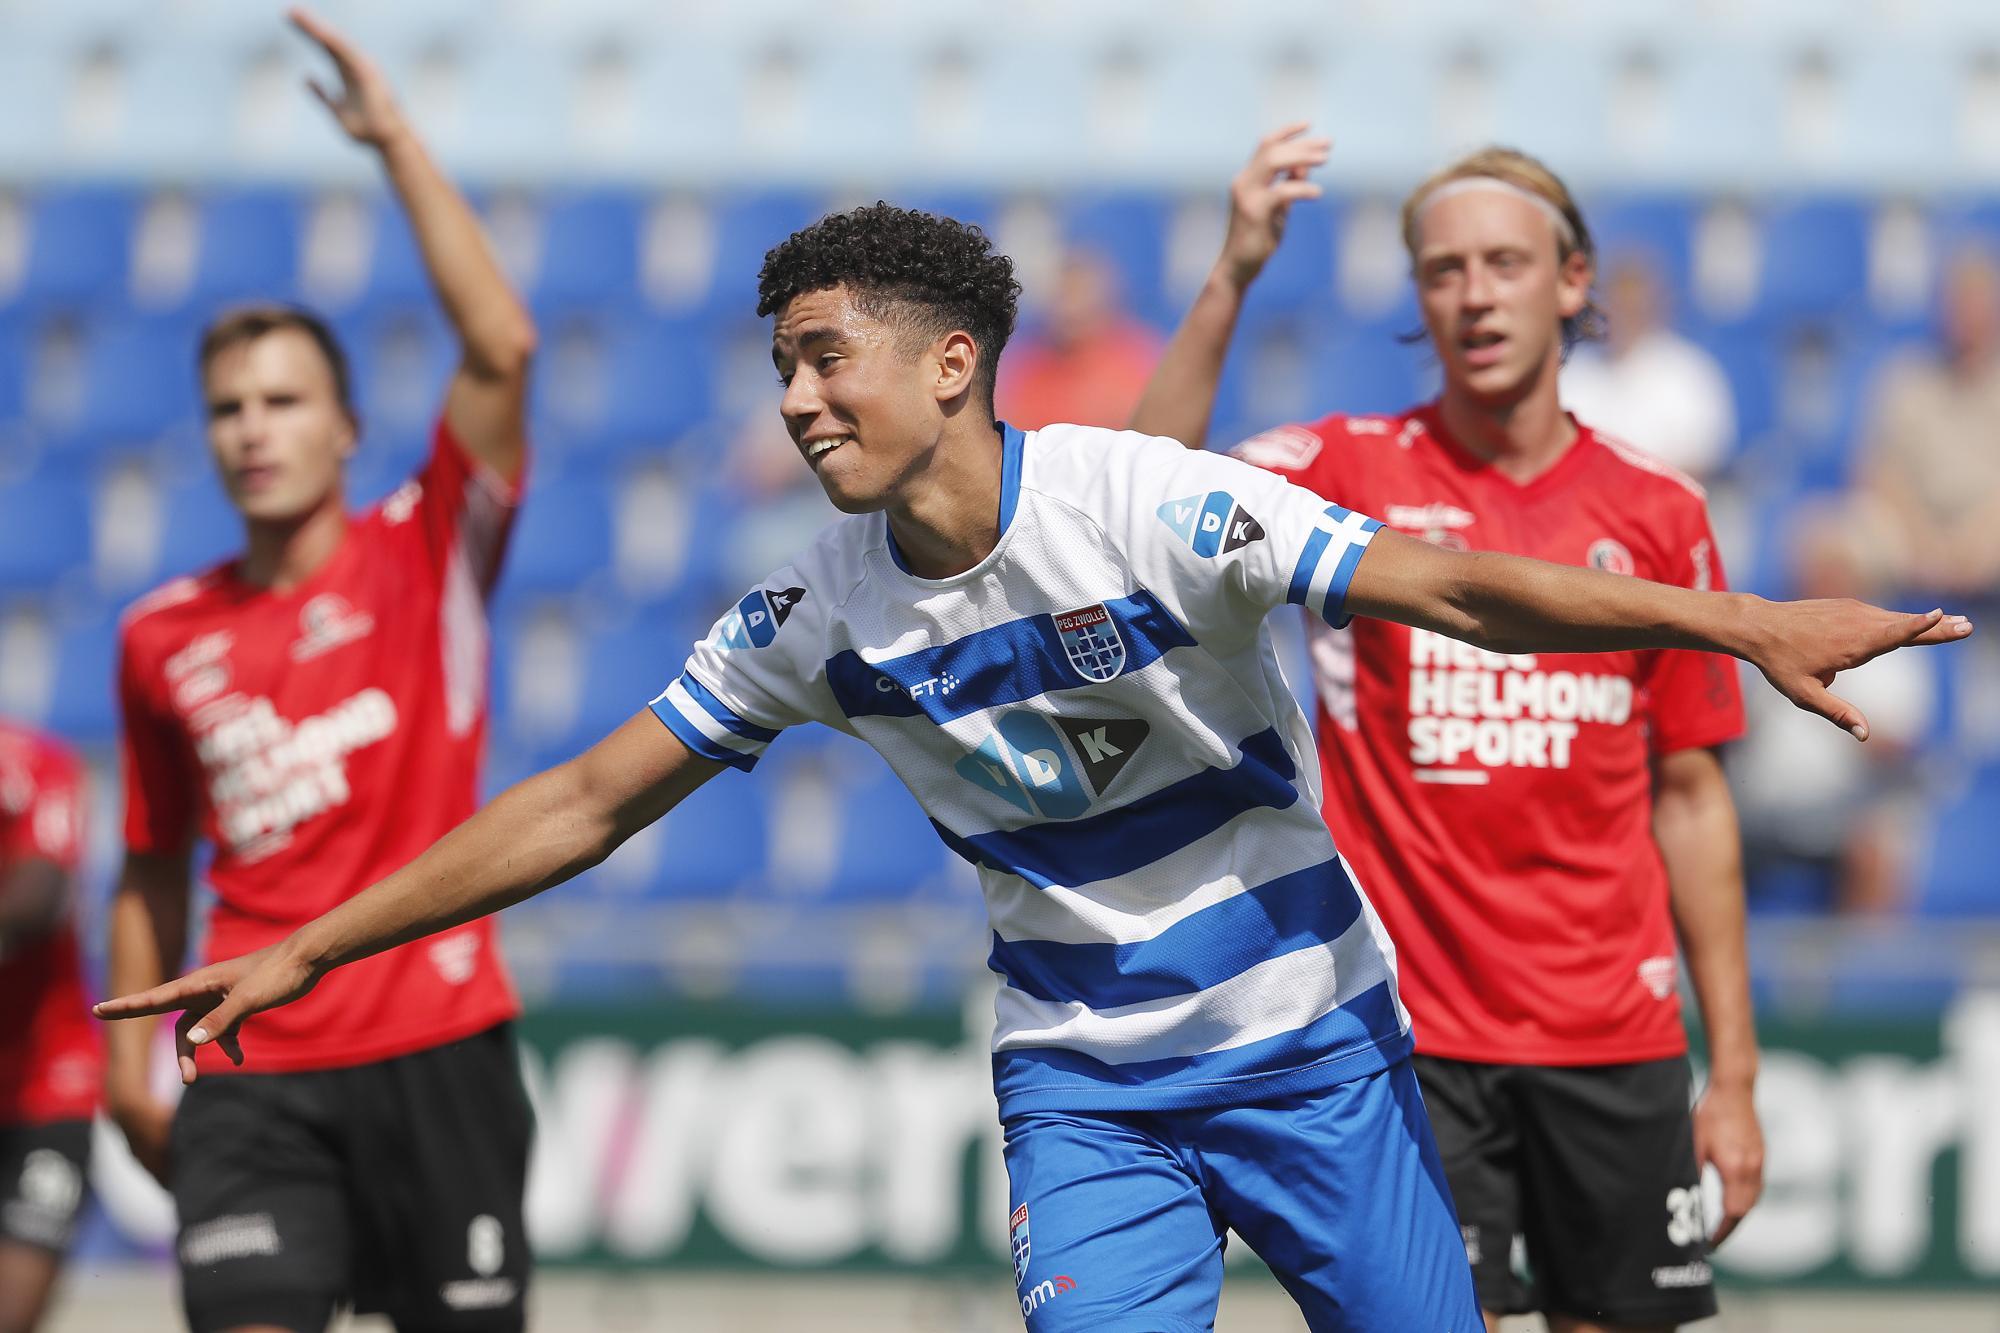 Zwolle_1-0.jpg